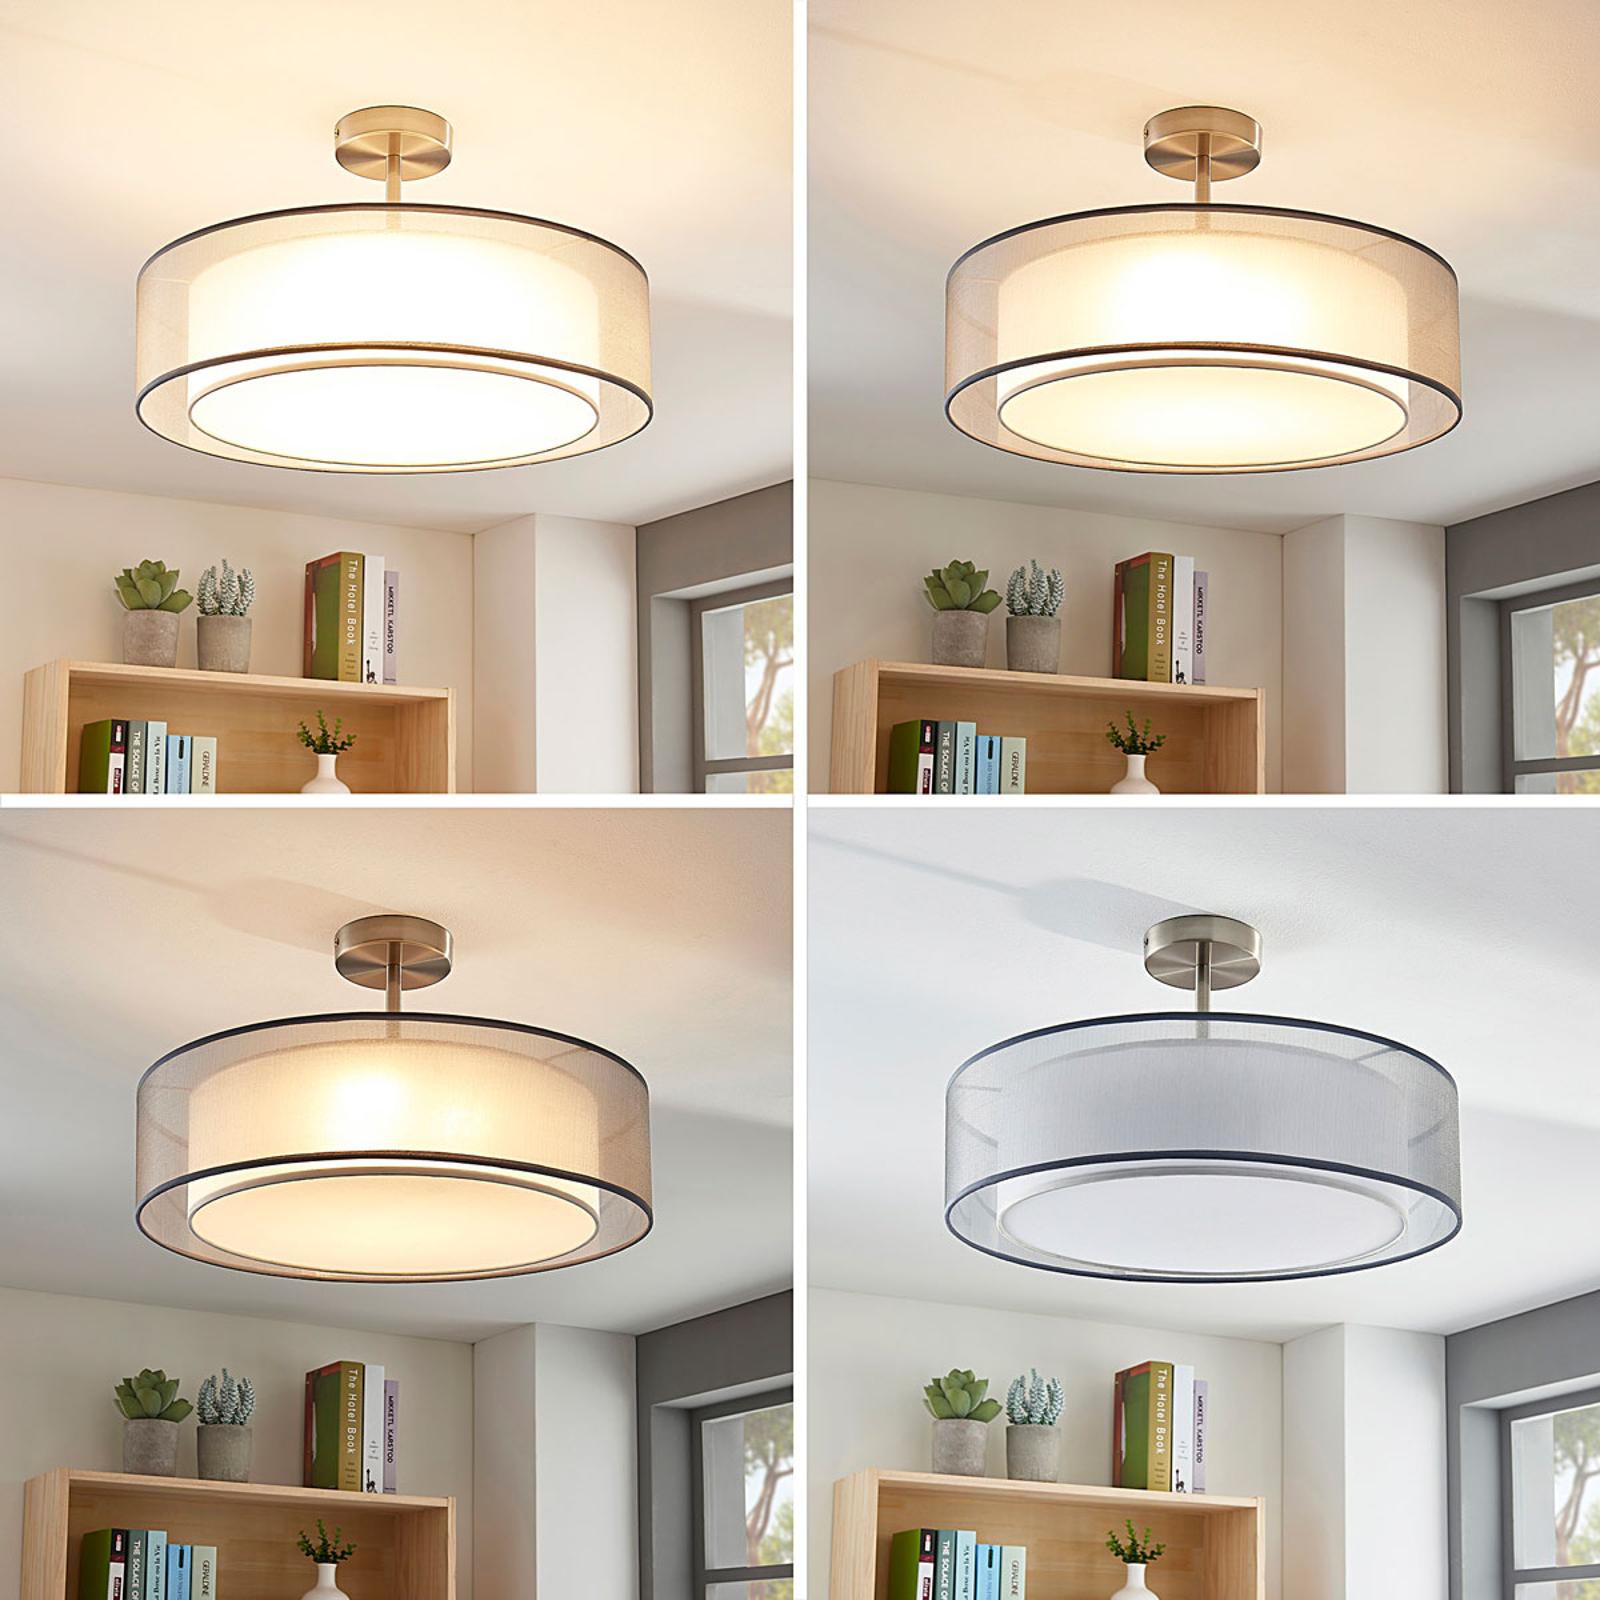 LED-taklampe Pikka, 3-trinns dimbar, grå